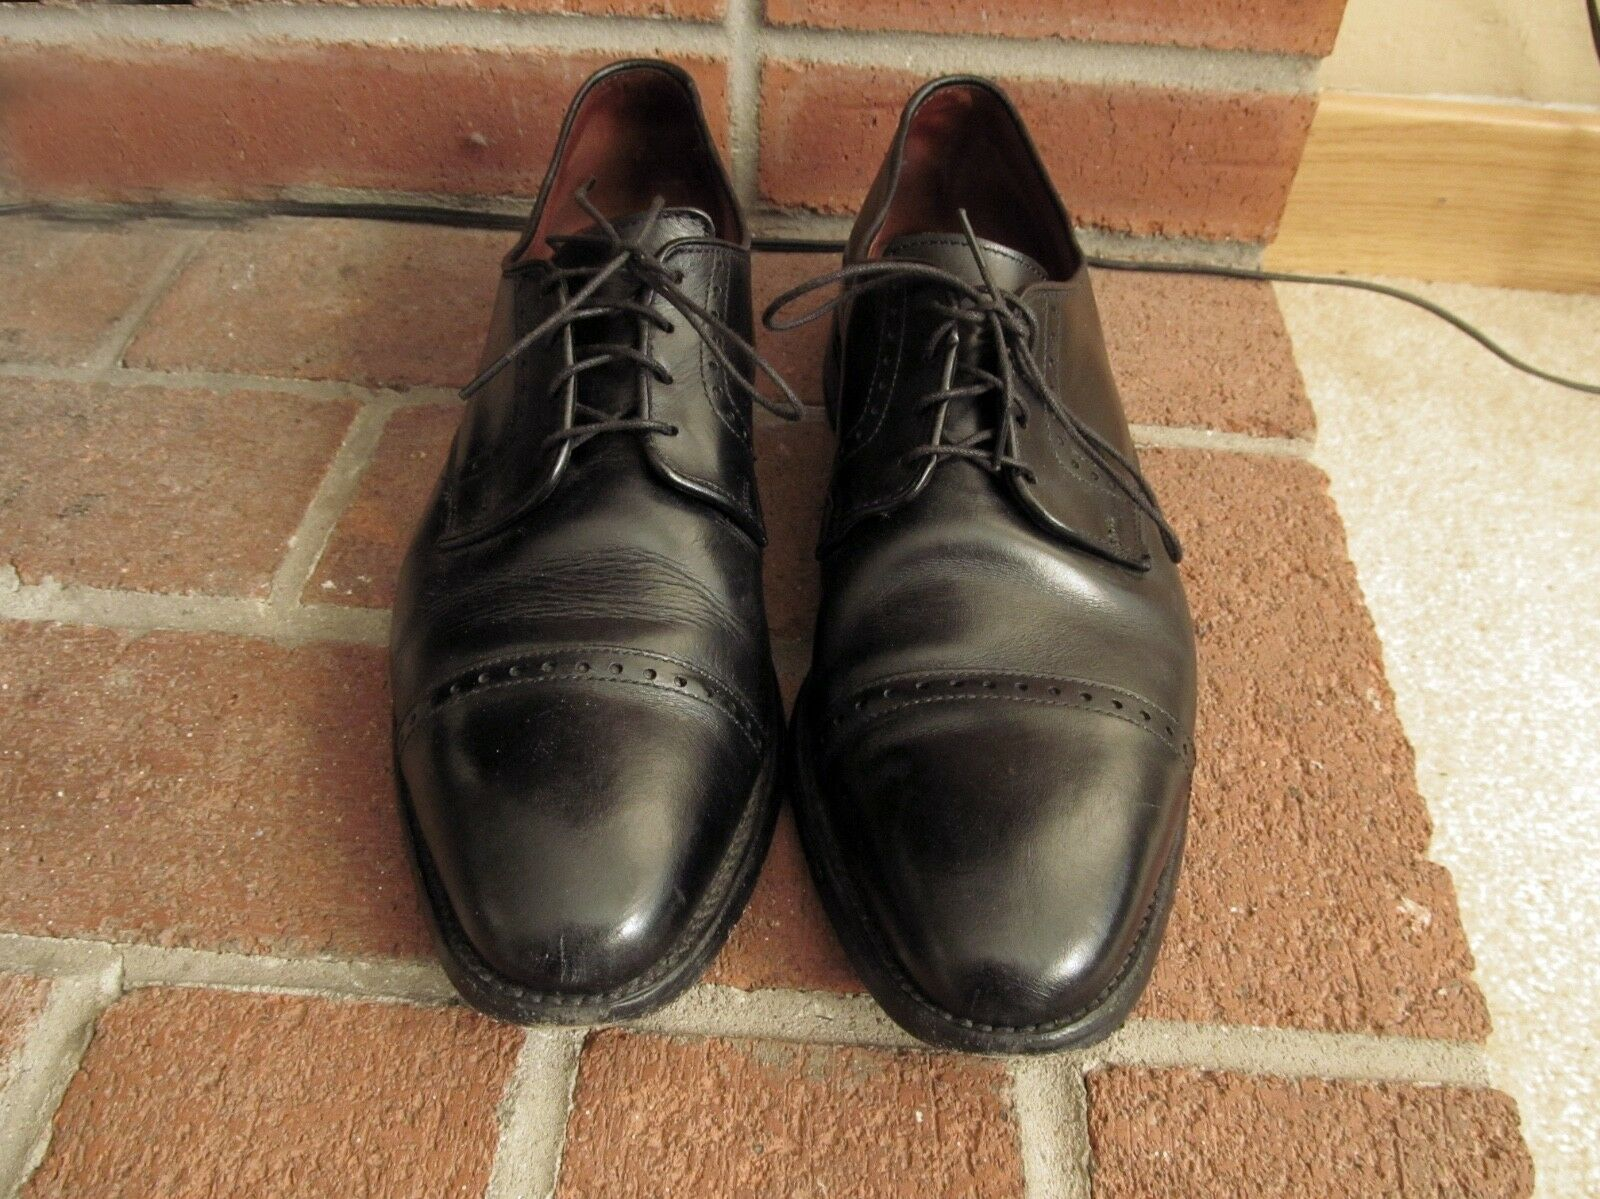 ALLEN EDMONDS CLIFTON Oxford Cuero Zapatos Vintage Tamaño 10.5-D Seminuevo